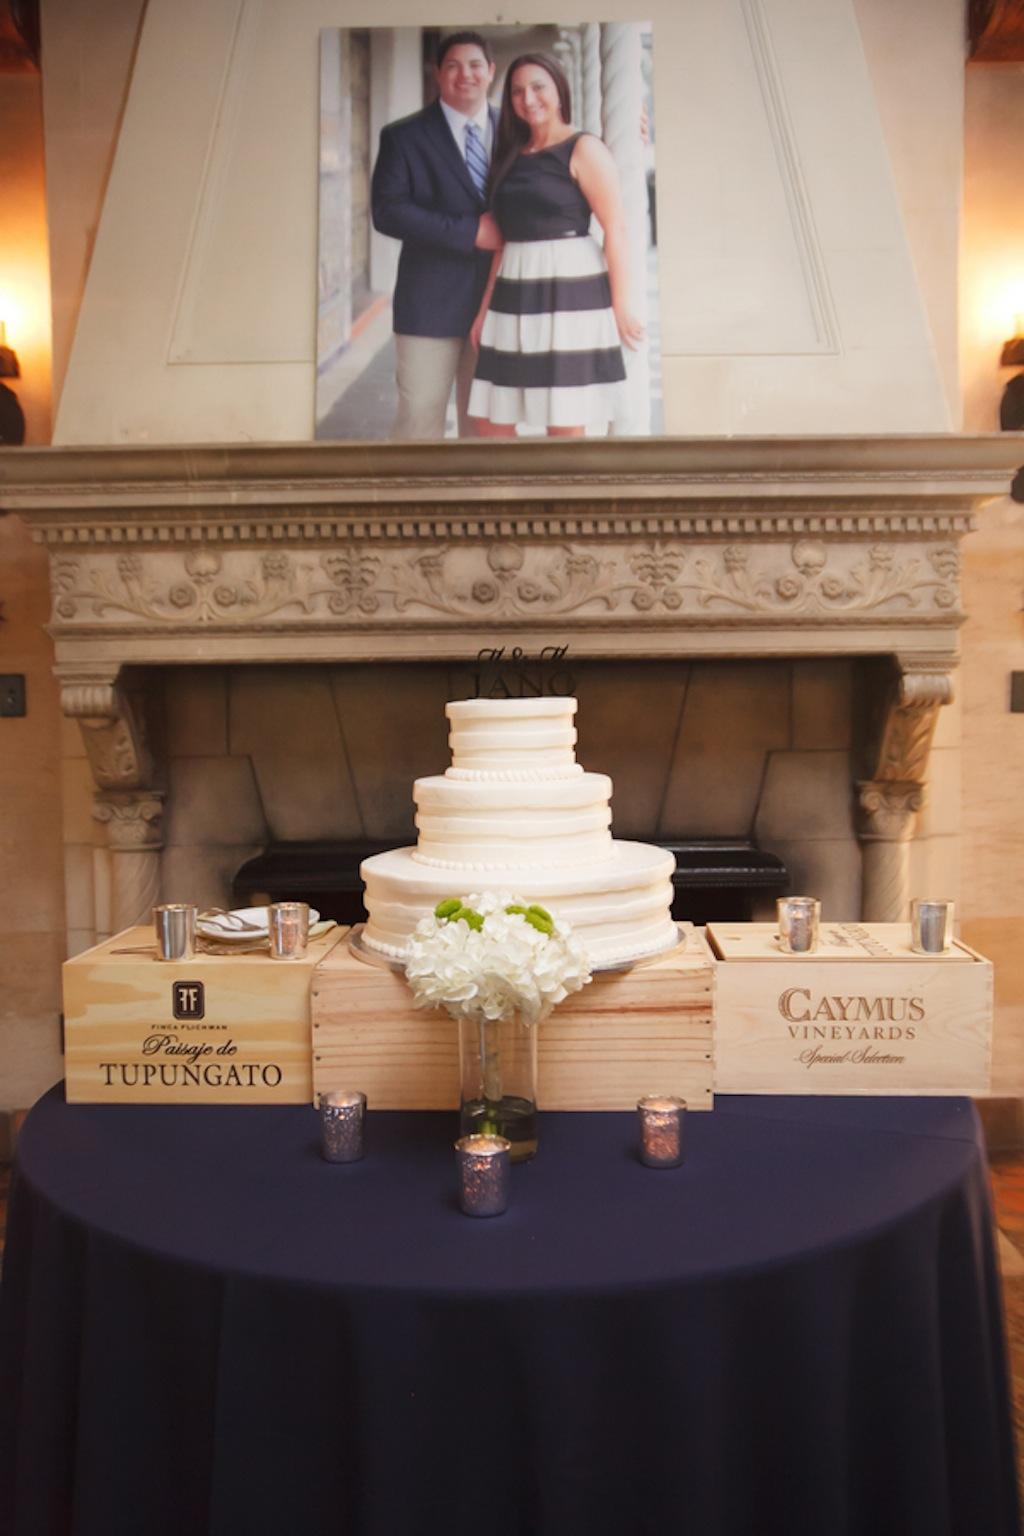 Round, White 3-Tiered Wedding Cake